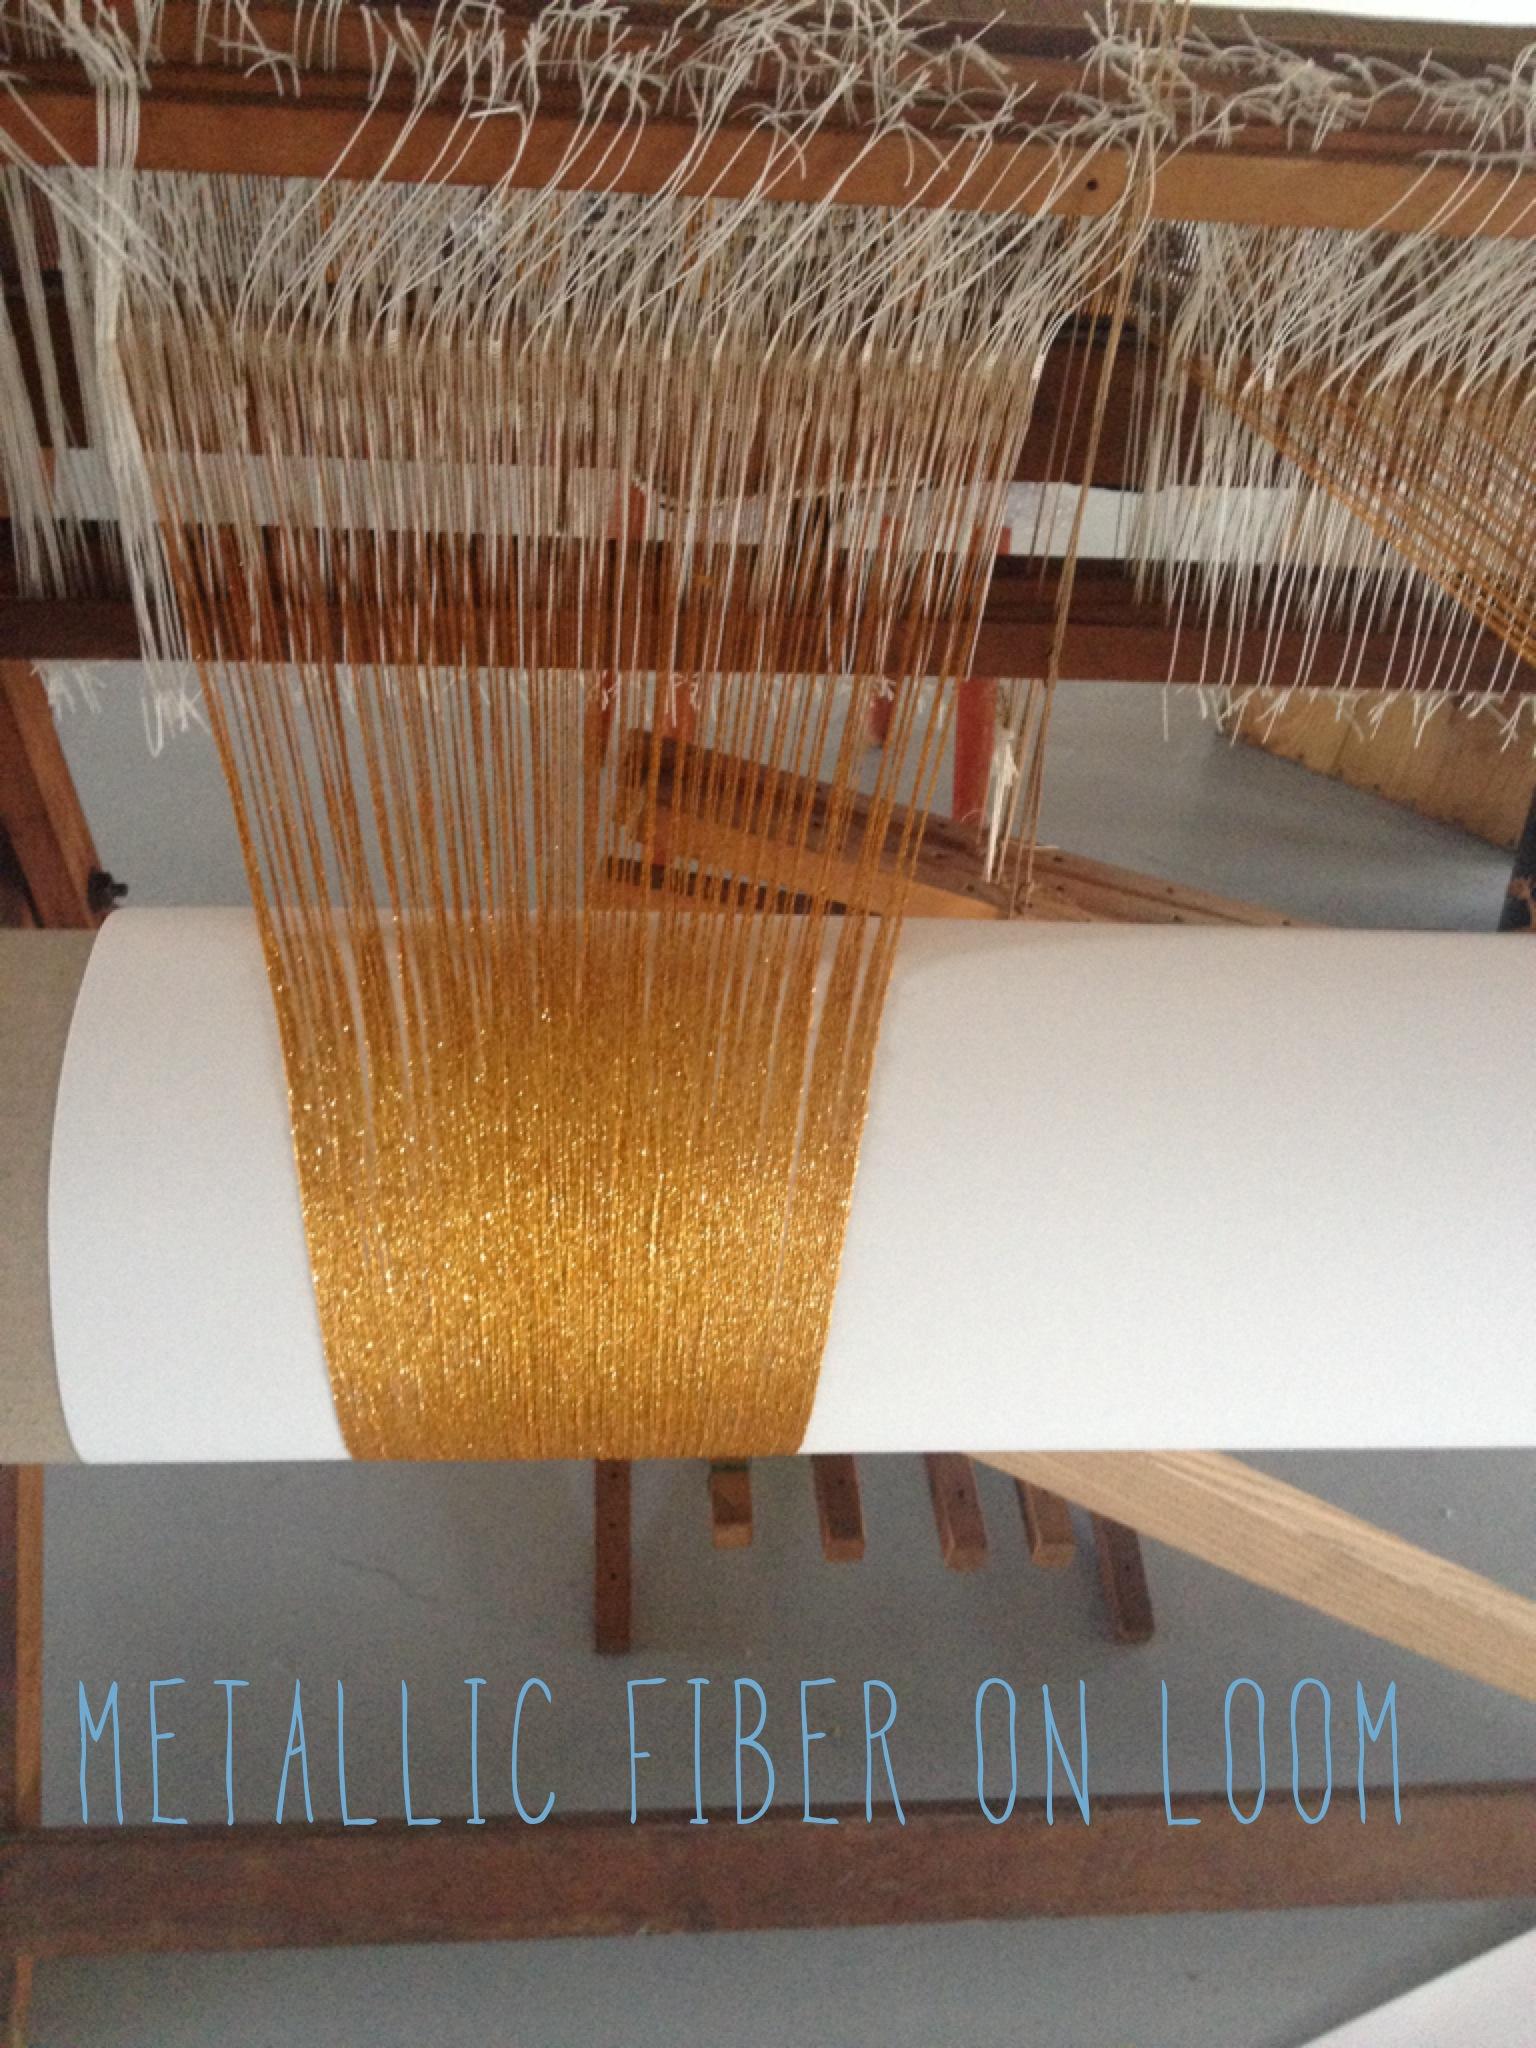 Justine Ashbee weave